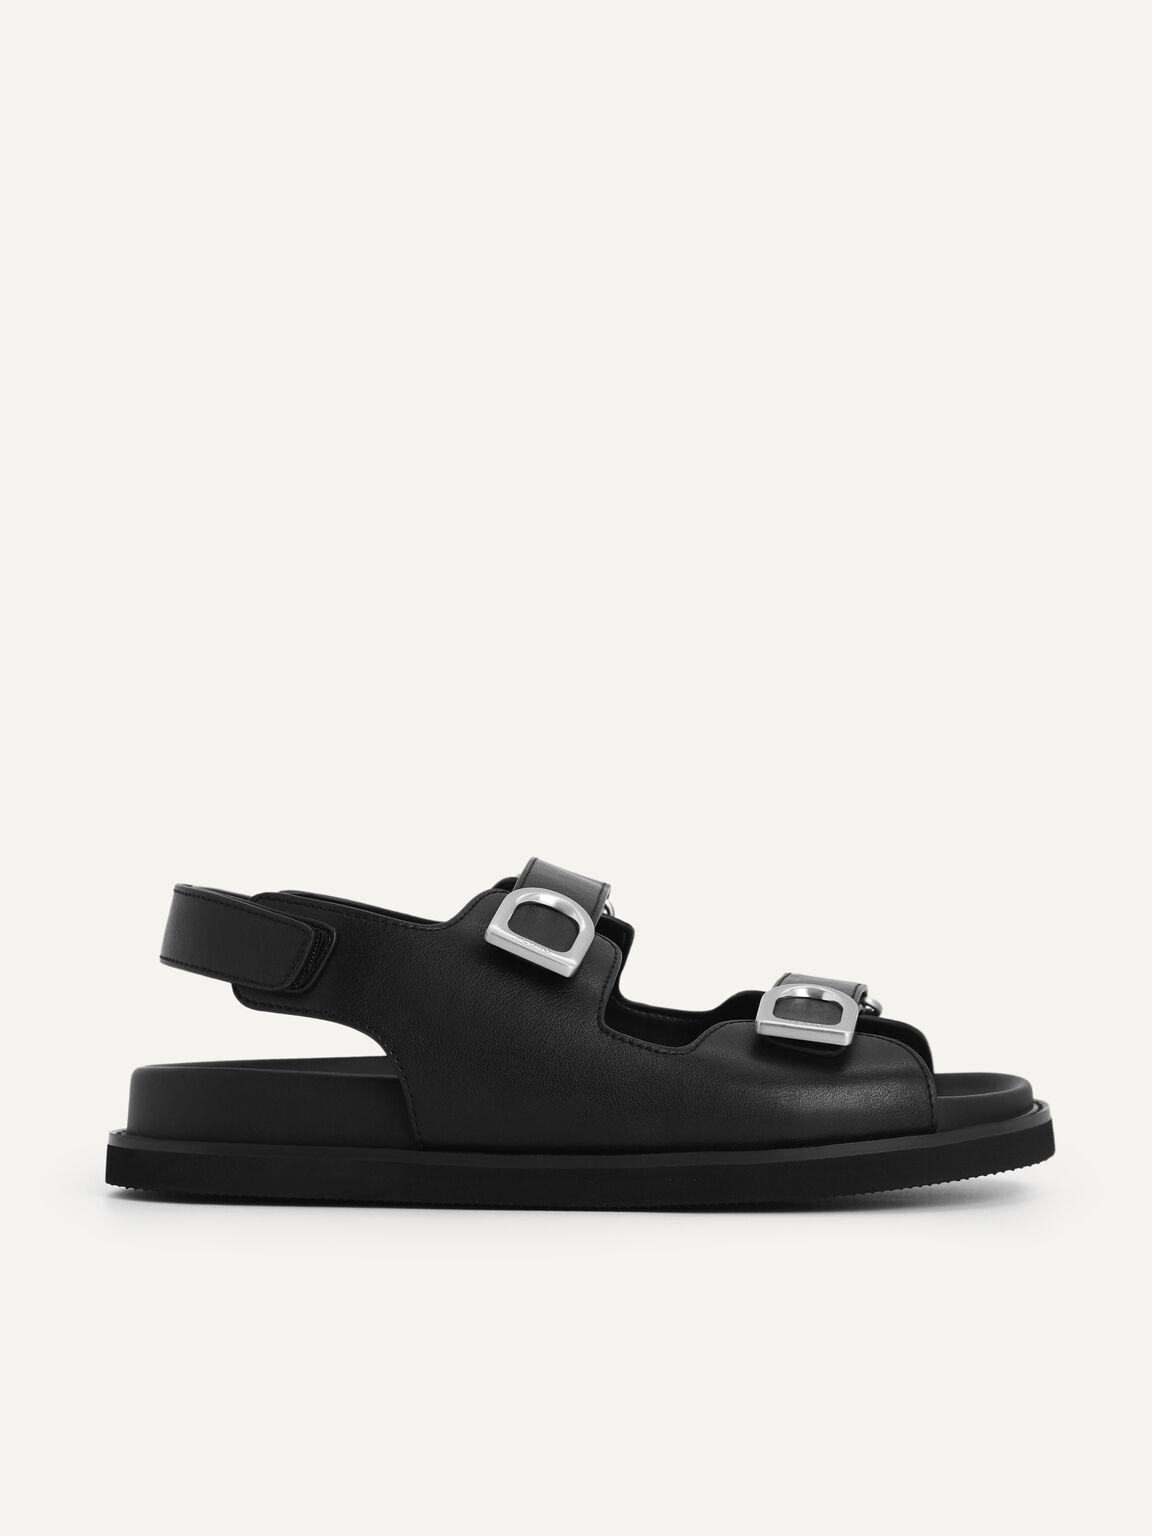 Double Strap Platform Sandals, Black, hi-res